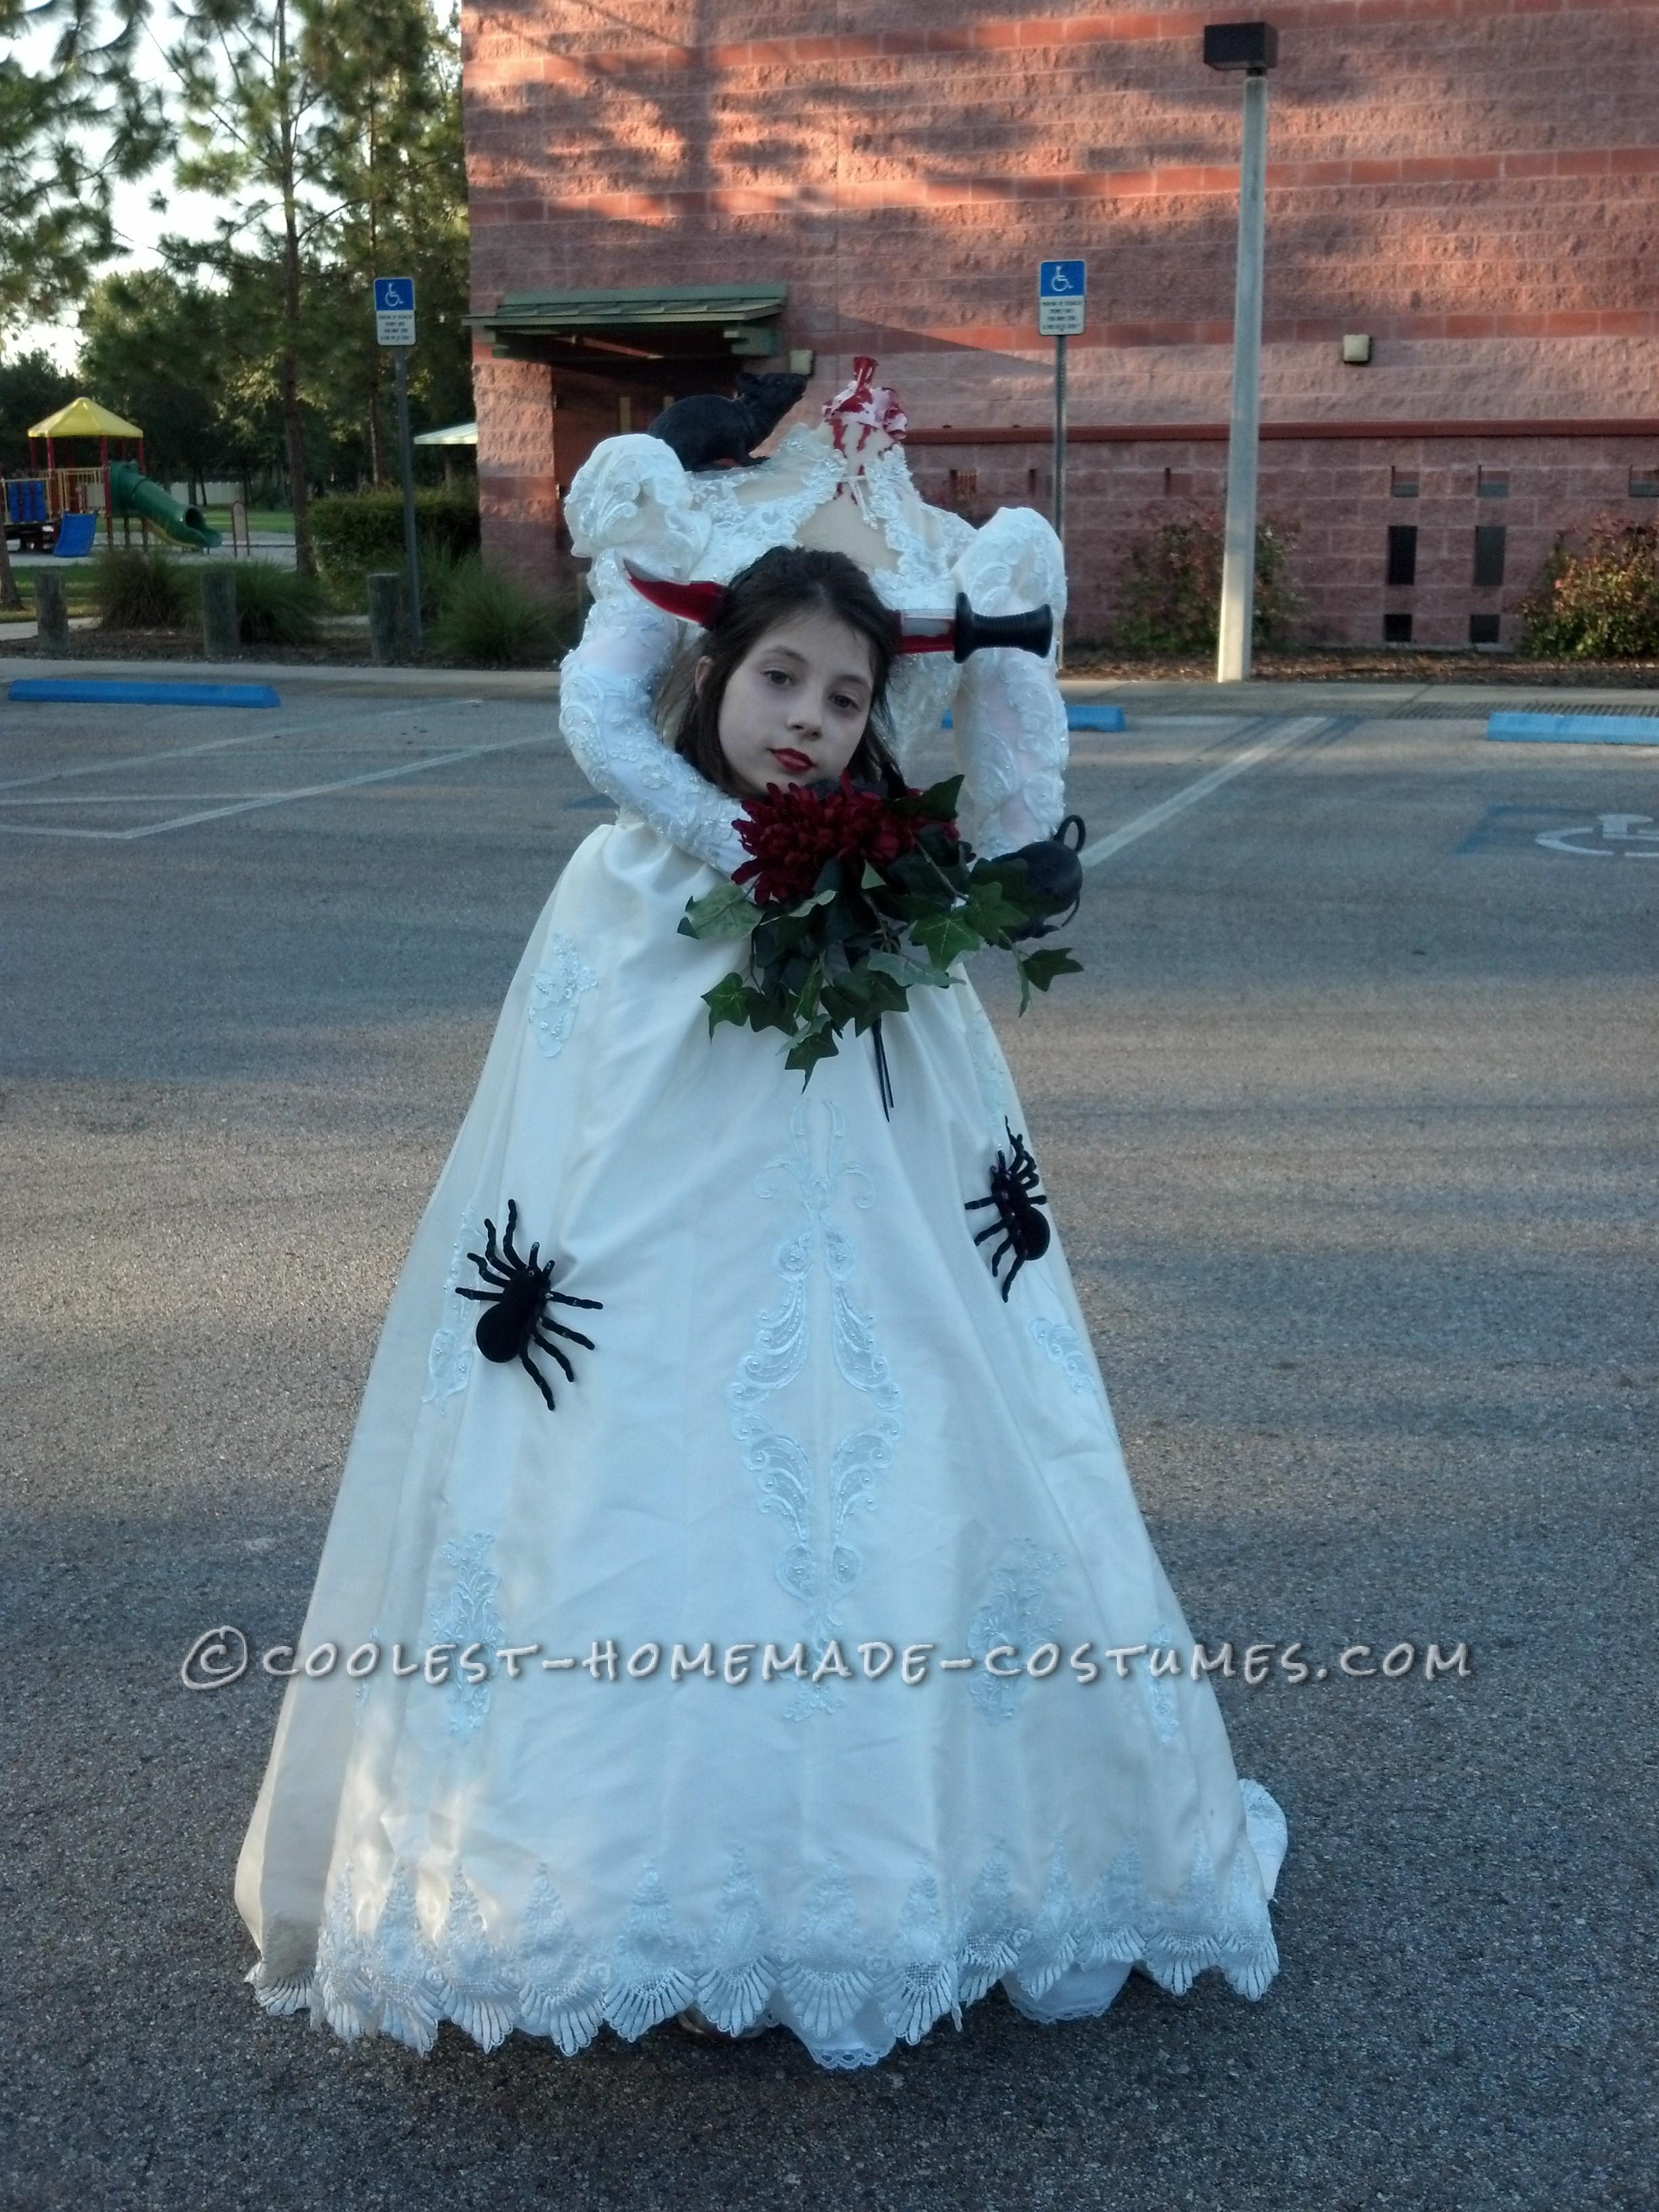 Cool Handmade Headless Bride Costume